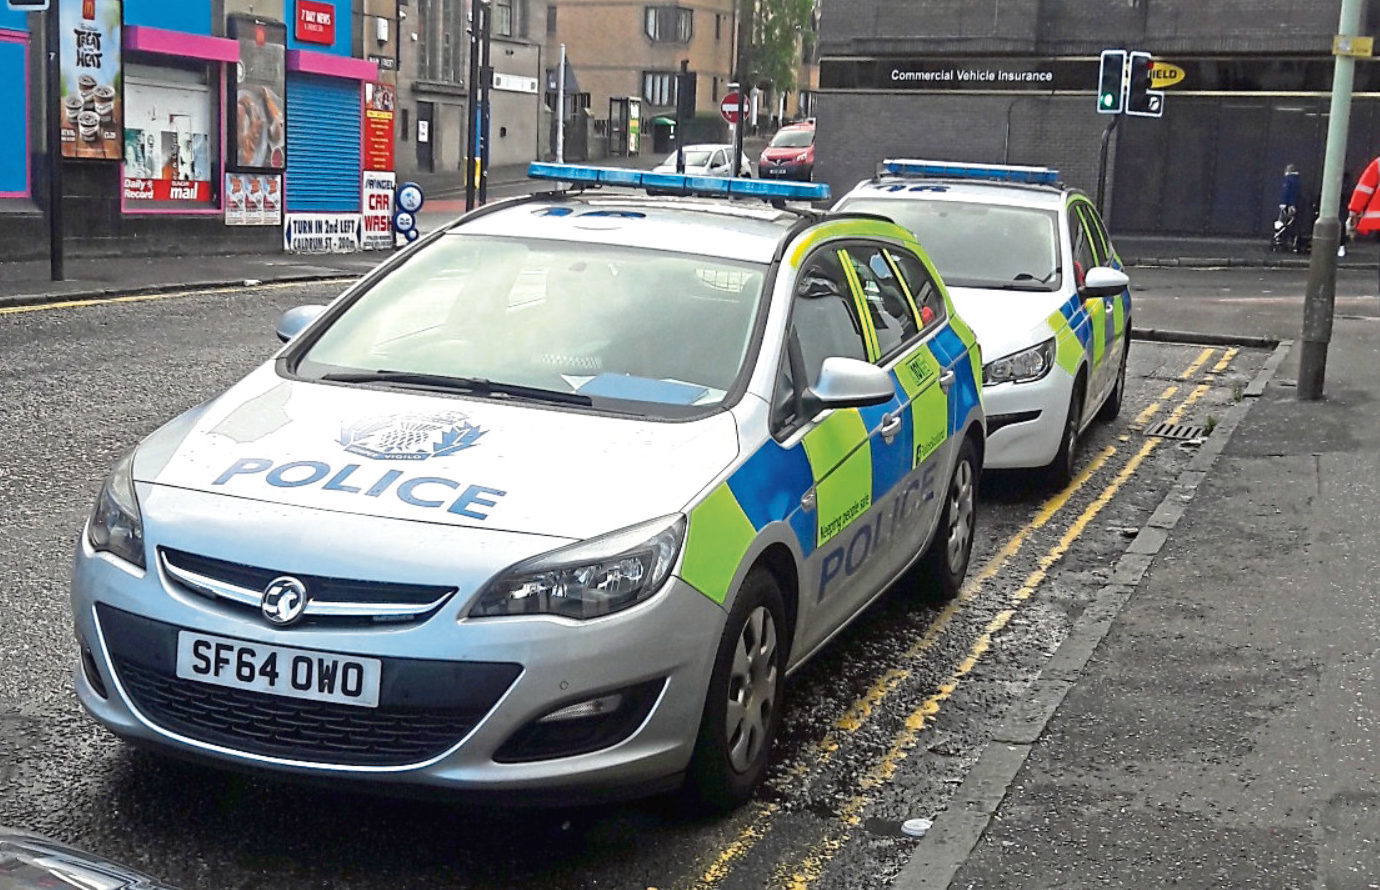 Police vehicles on Main Street